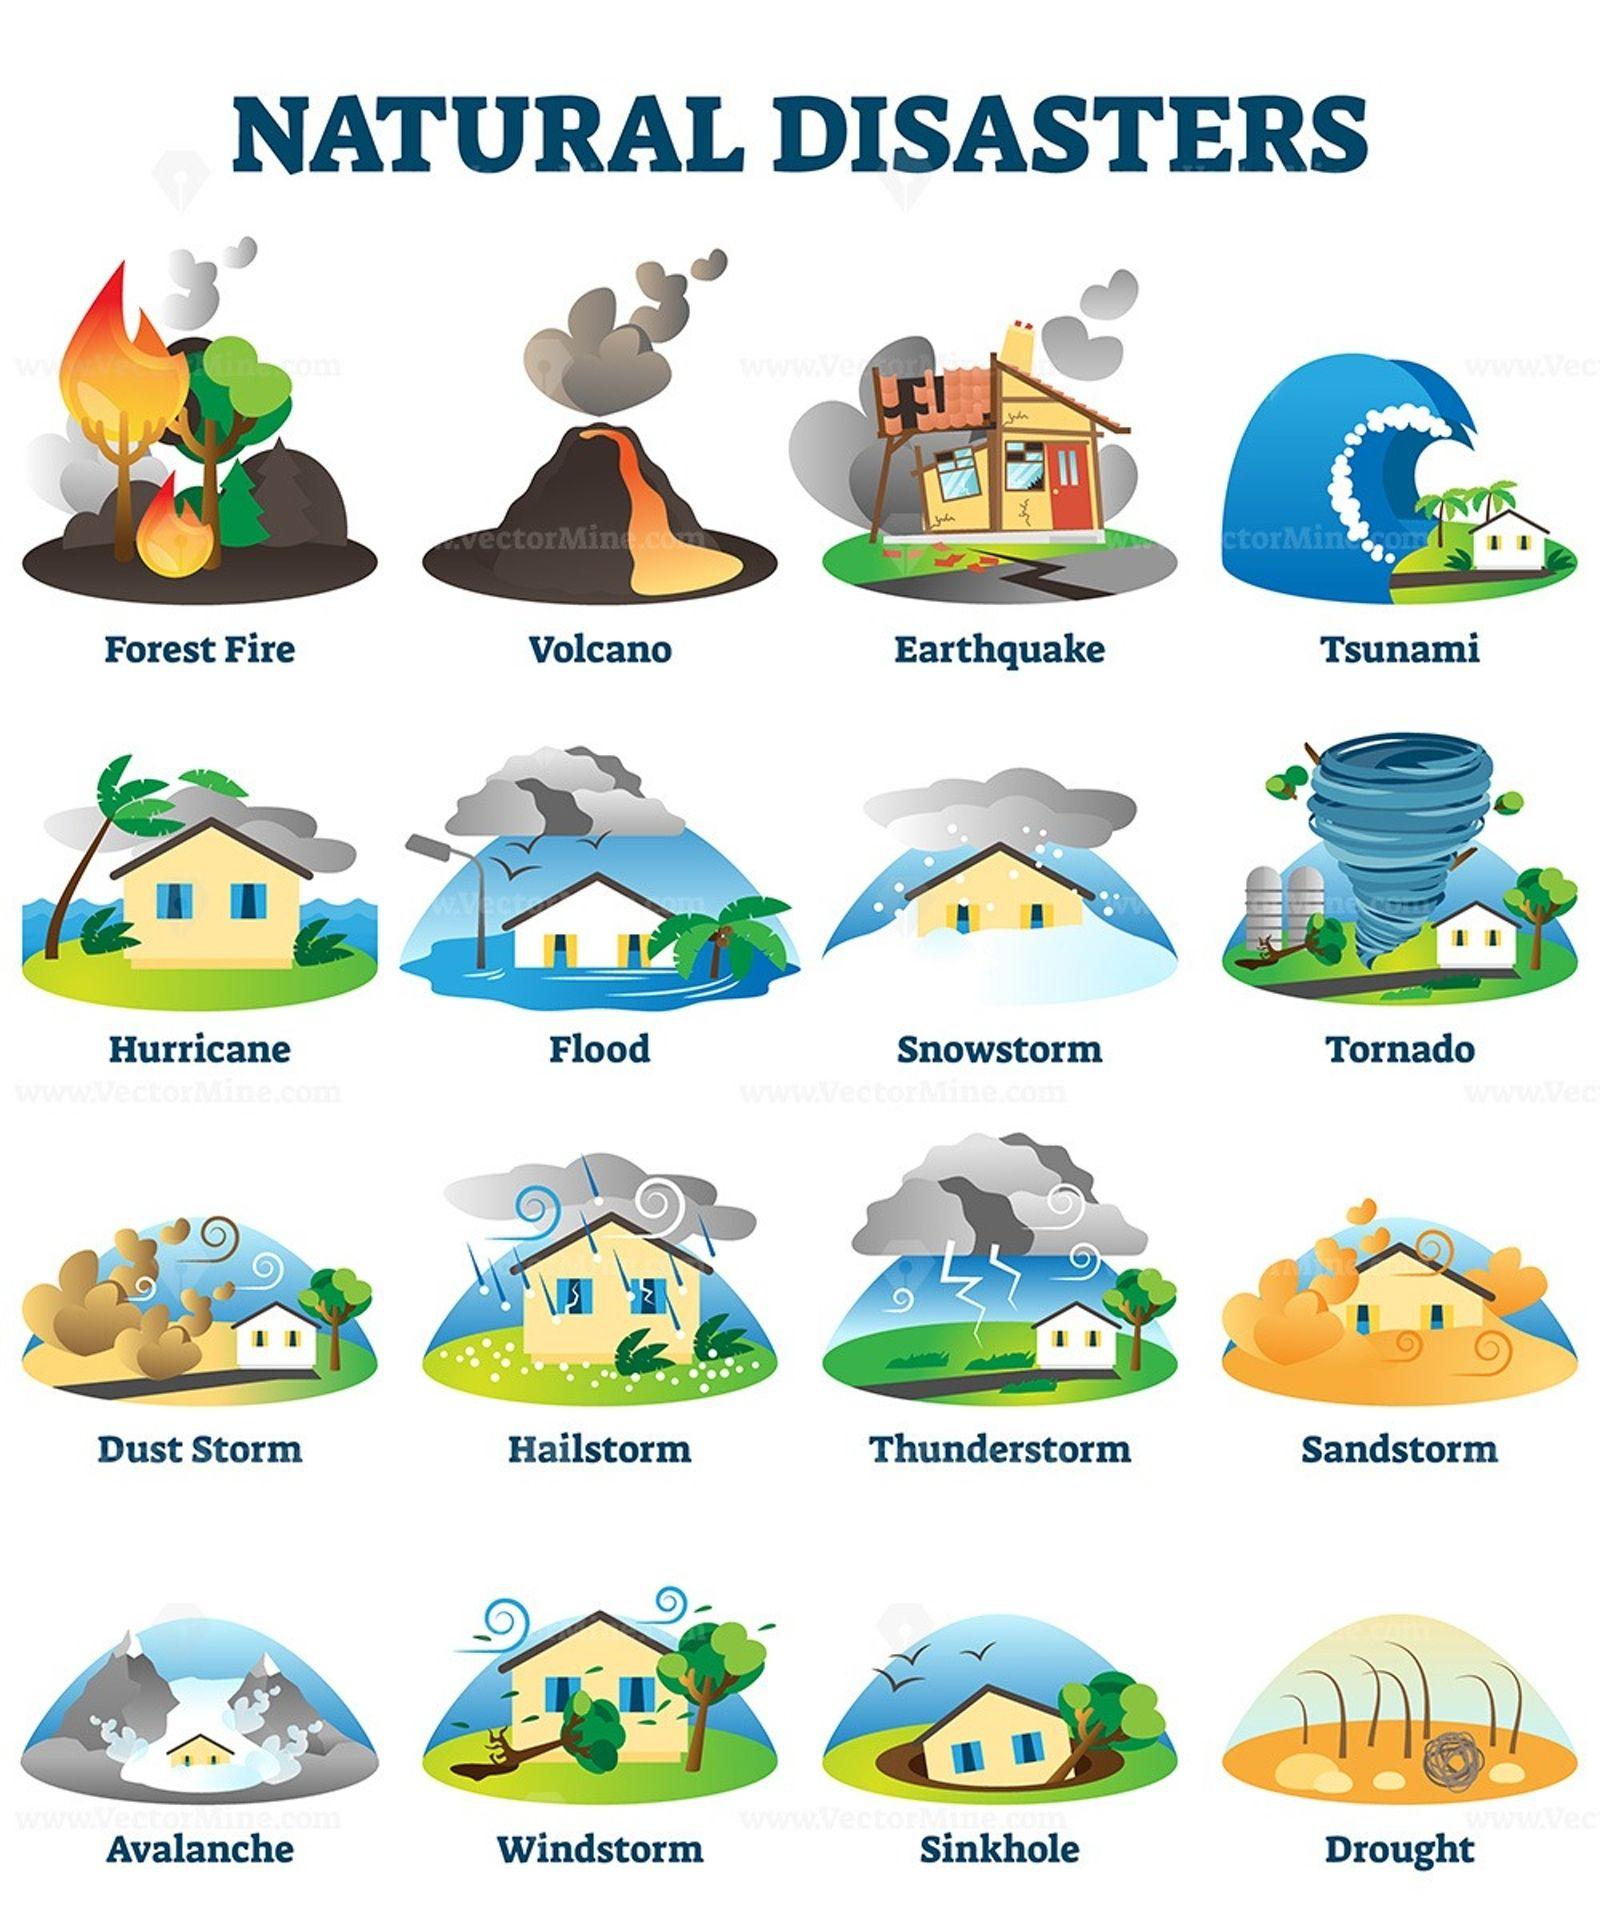 Natural Disasters Vector Illustration Natural Disasters Natural Disasters Art Natural Disasters For Kids [ 1920 x 1600 Pixel ]